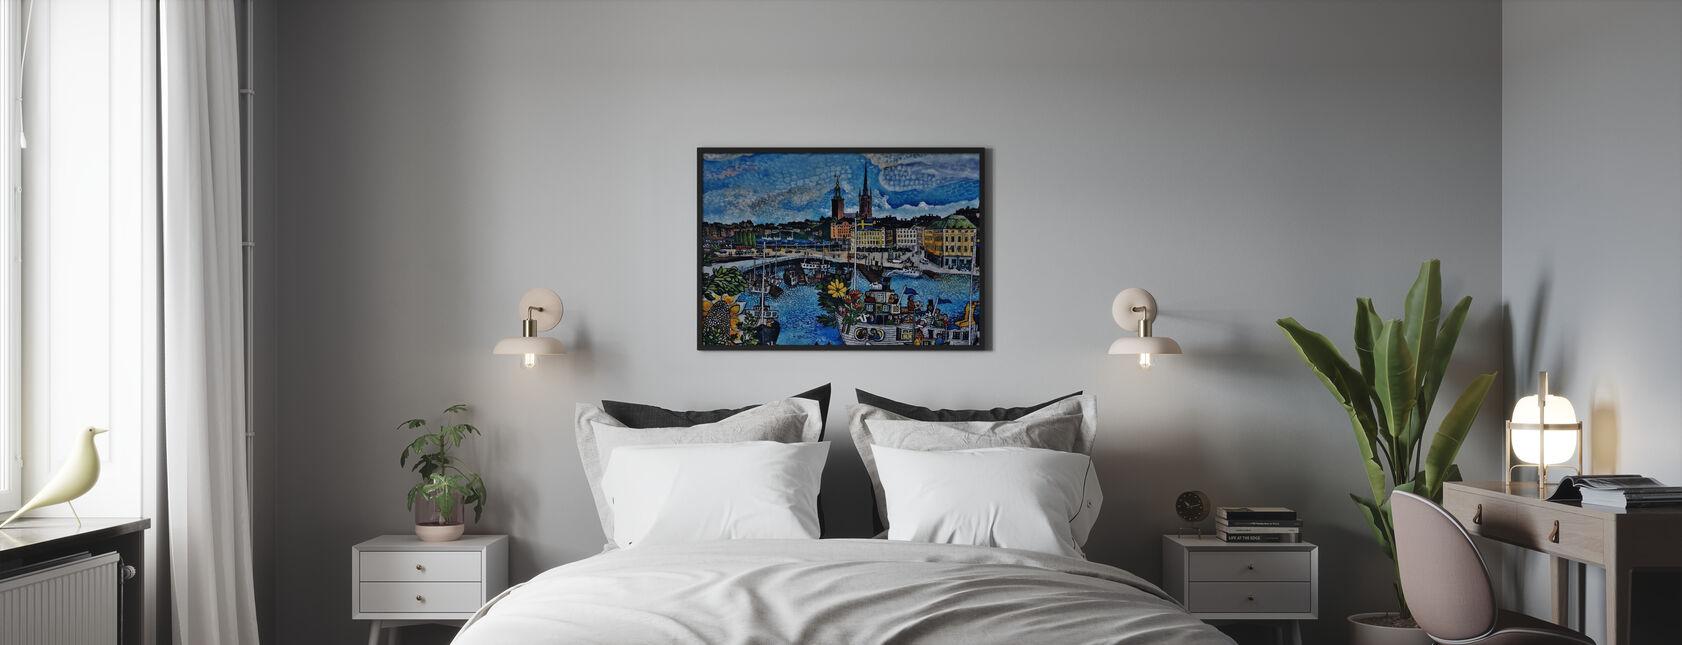 City Pier Painting - Framed print - Bedroom